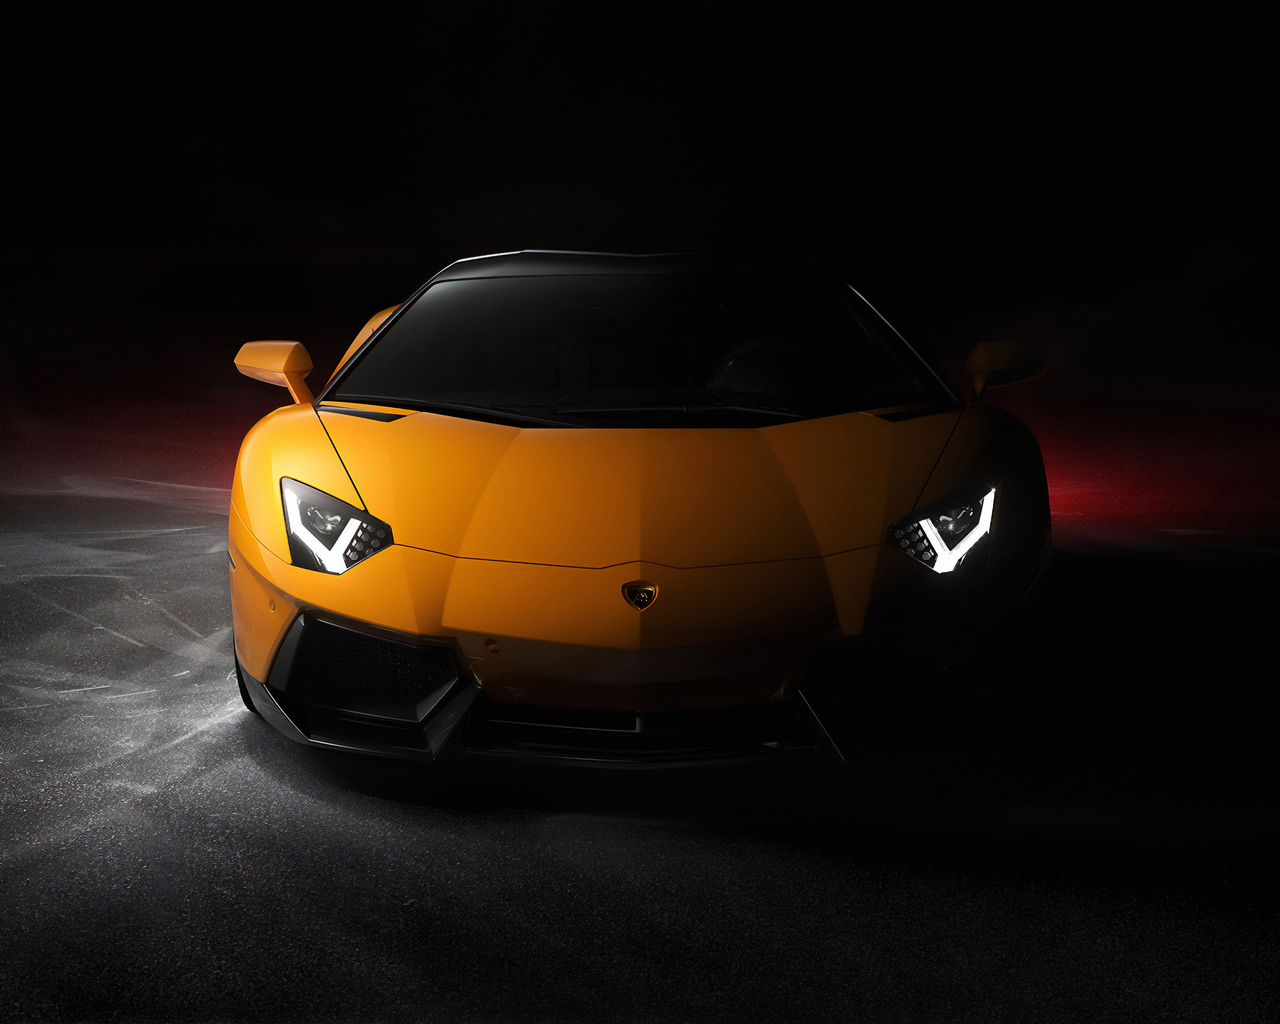 yellow-lamborghini-aventador-front-9i.jpg